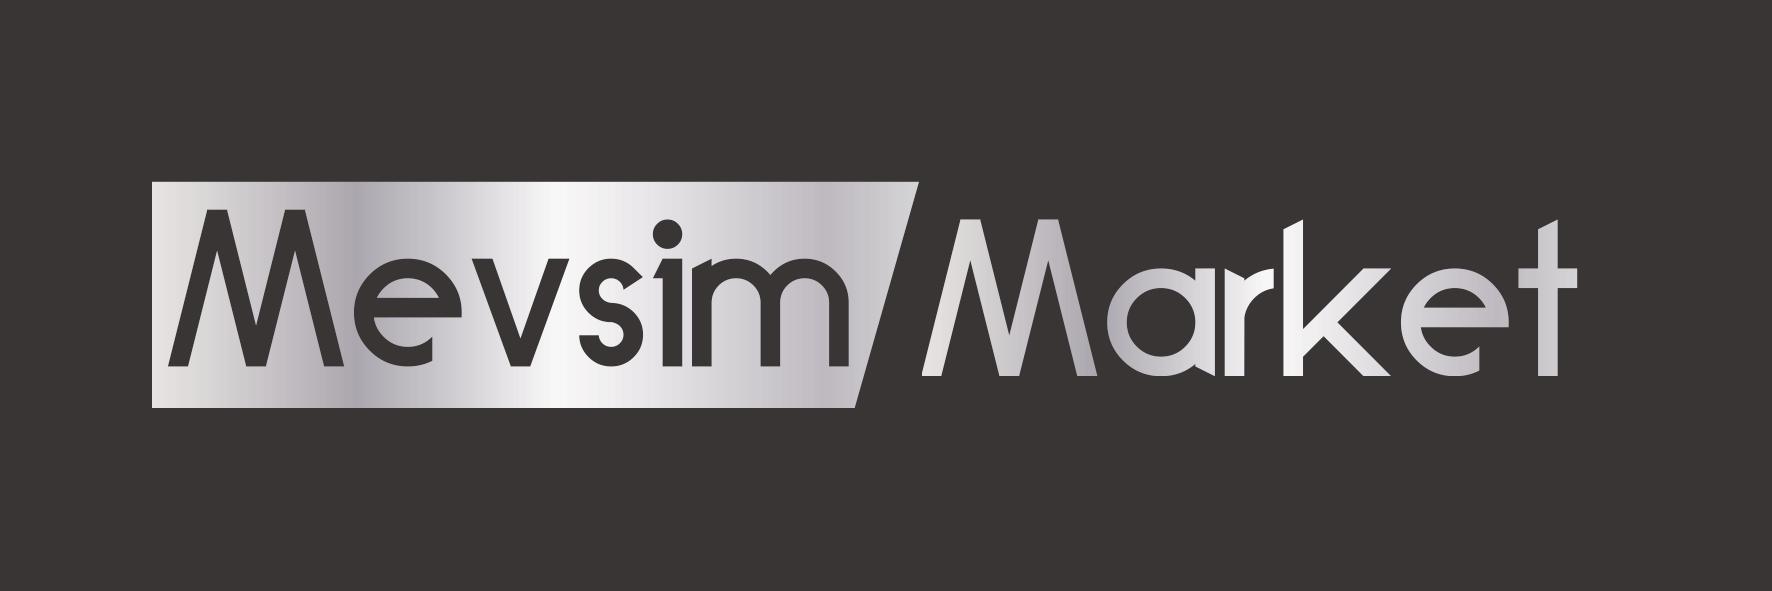 http://usepmm.fr/wp-content/uploads/2021/03/Mevsim-Market_page-0001.jpg